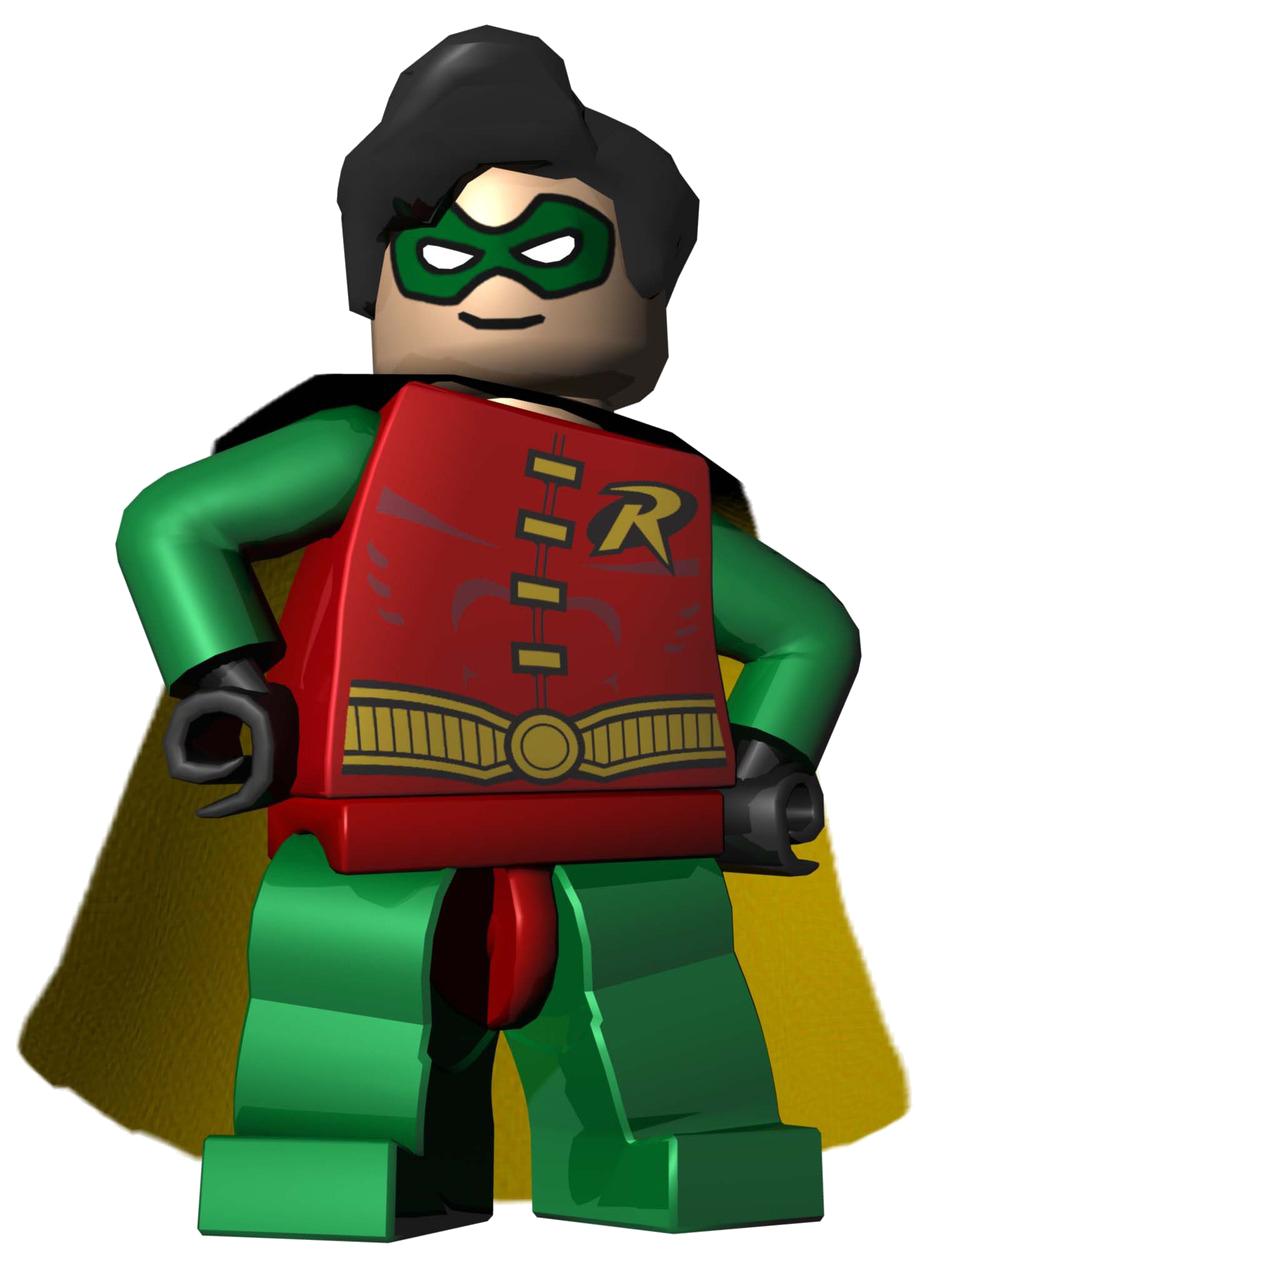 1280x1280 Batman Lego Free Images